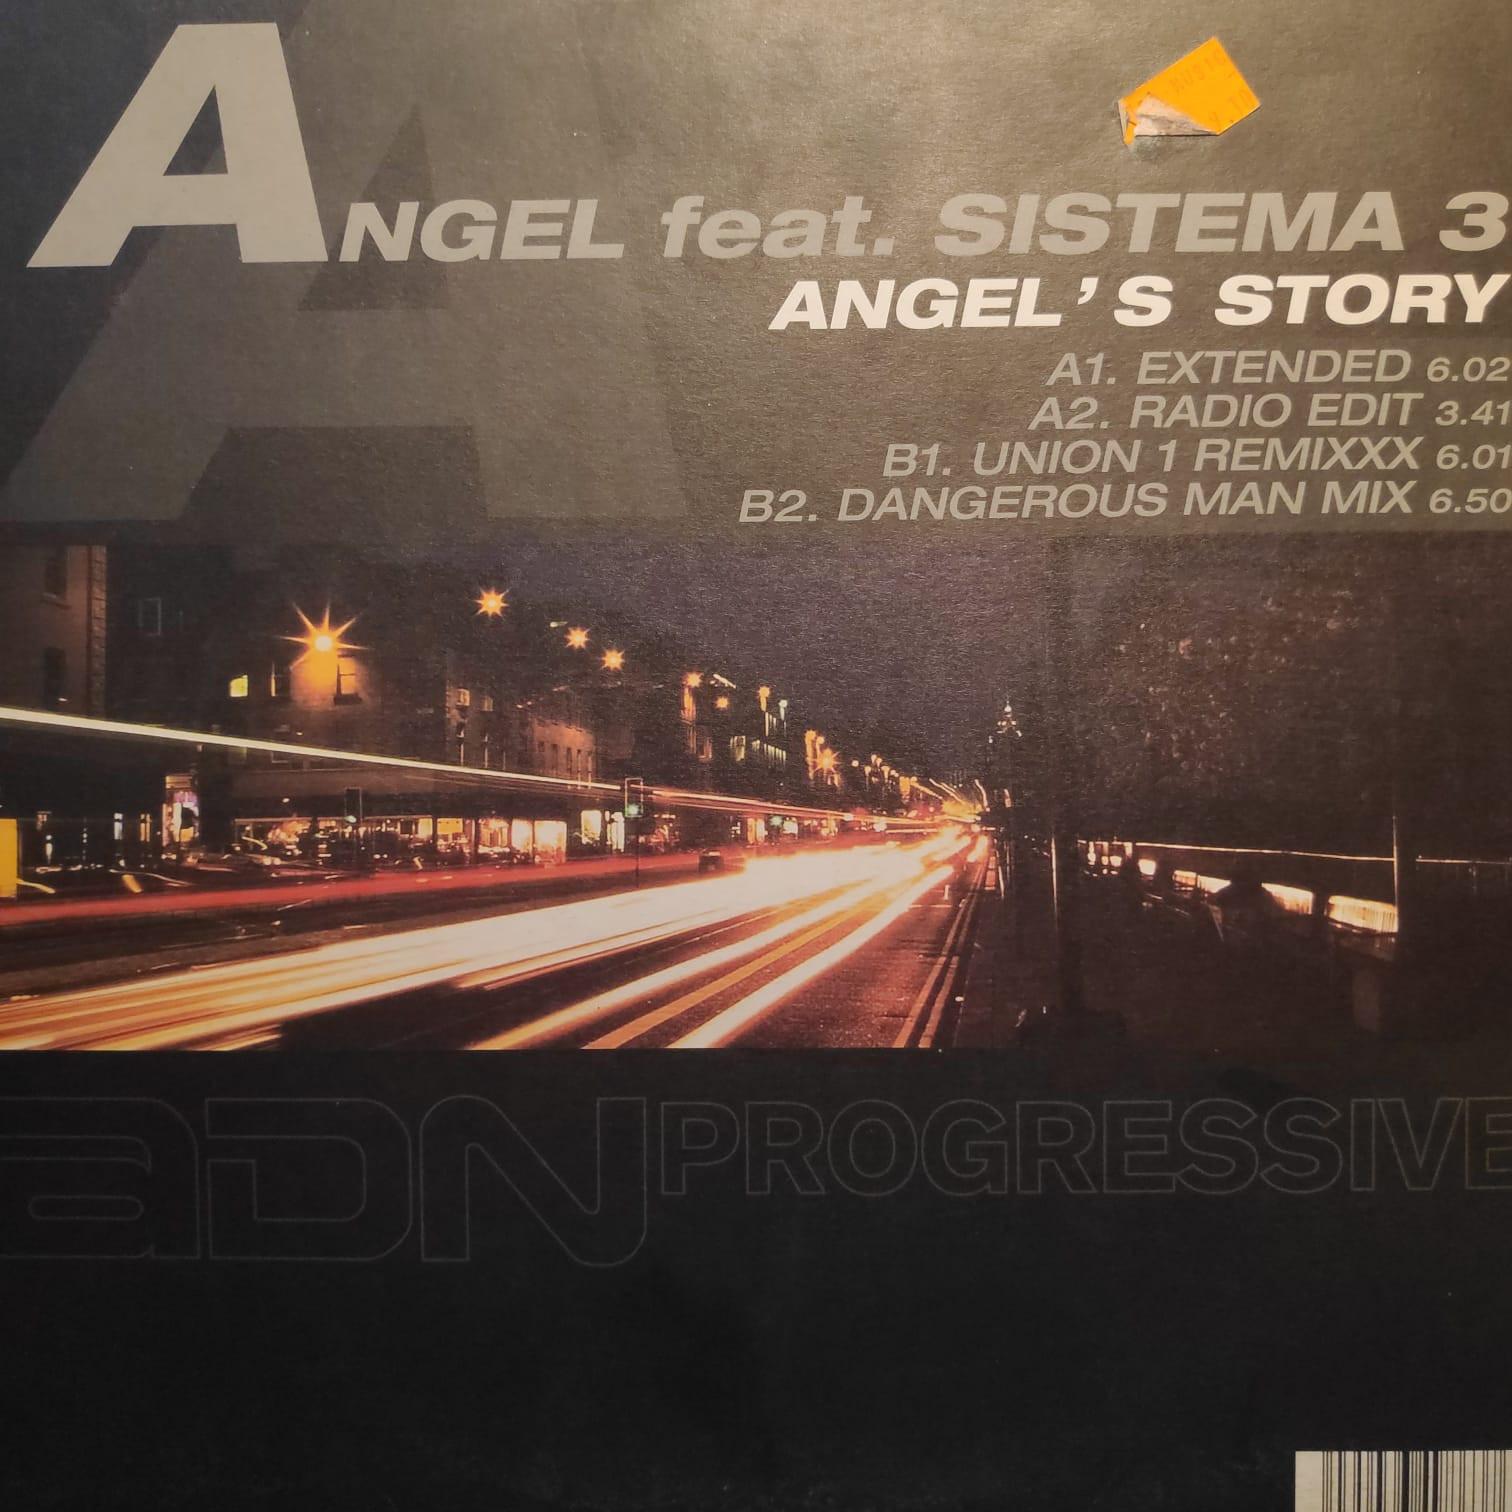 (1440) Angel Feat. Sistema 3 – Angel's Story